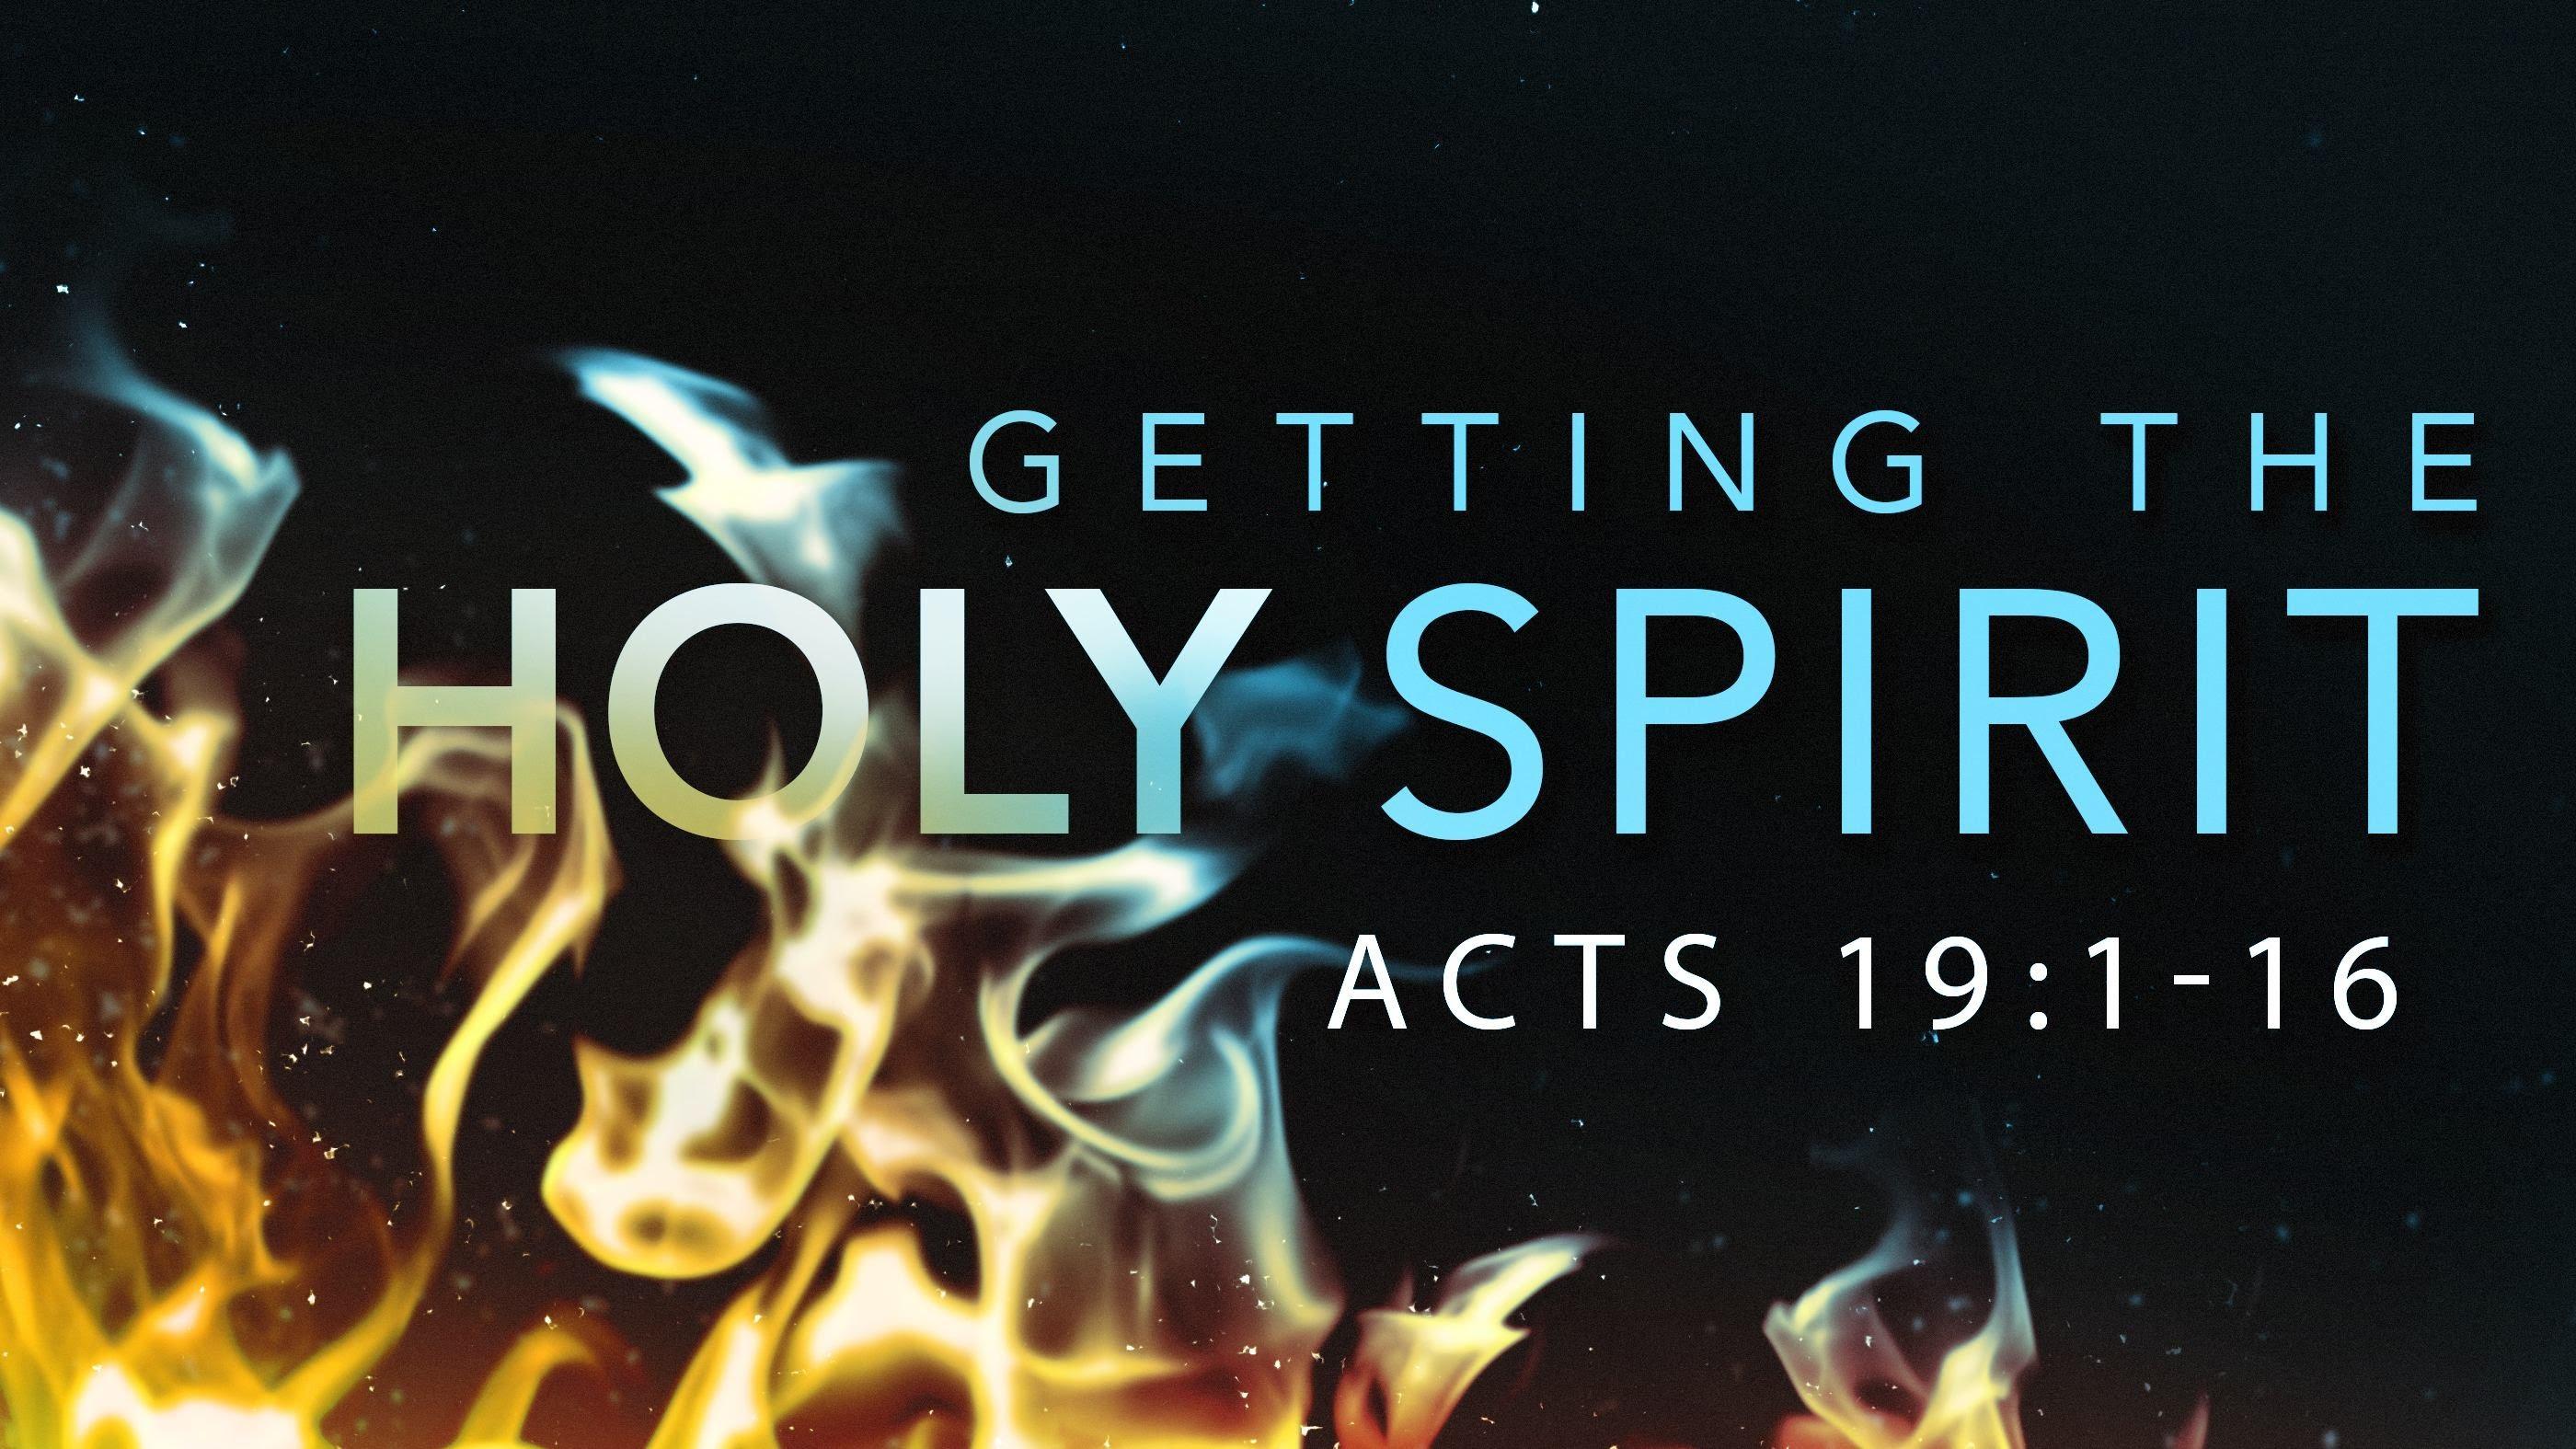 Holy Spirit Baptism 2 - Two baptisms | Bite Sized Truth